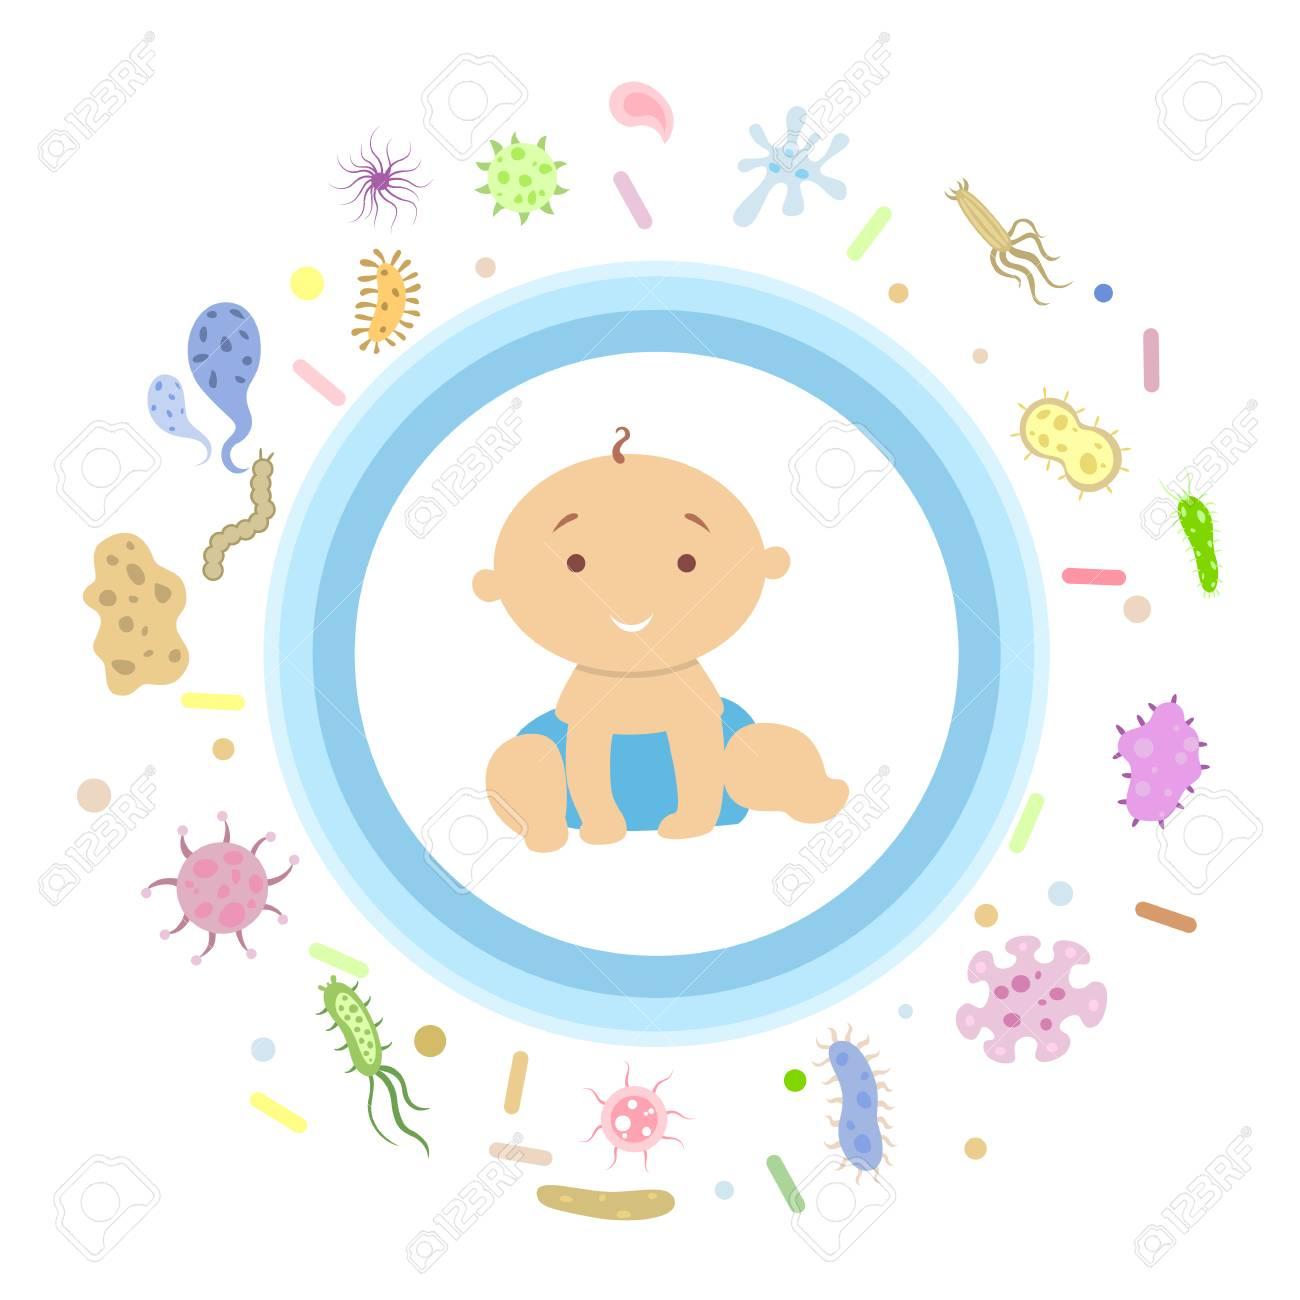 Baby boy under shield. - 97616820